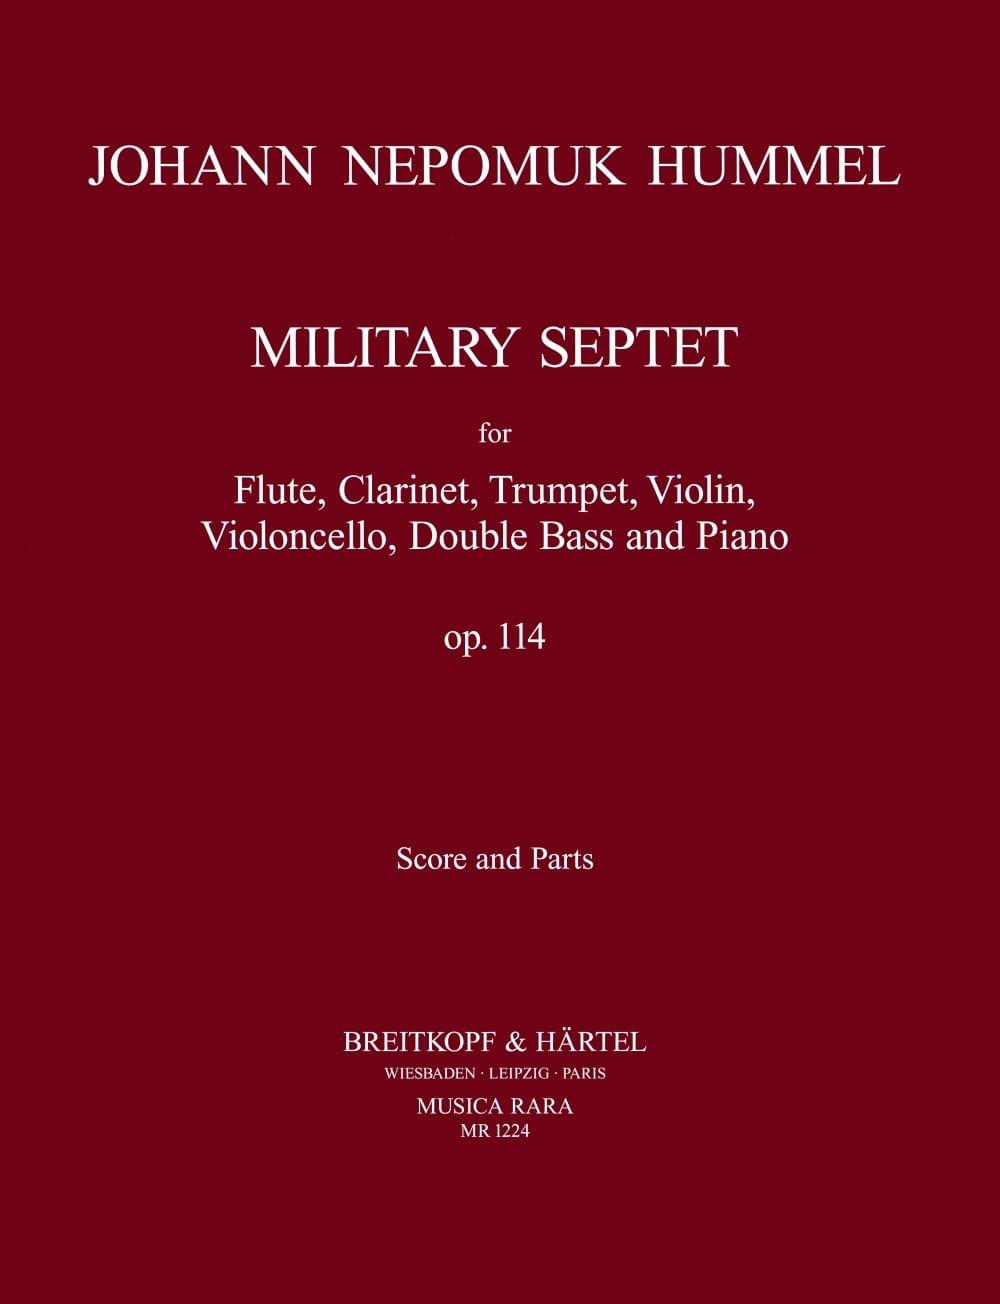 Military Septet op. 114 -Score + parts - HUMMEL - laflutedepan.com